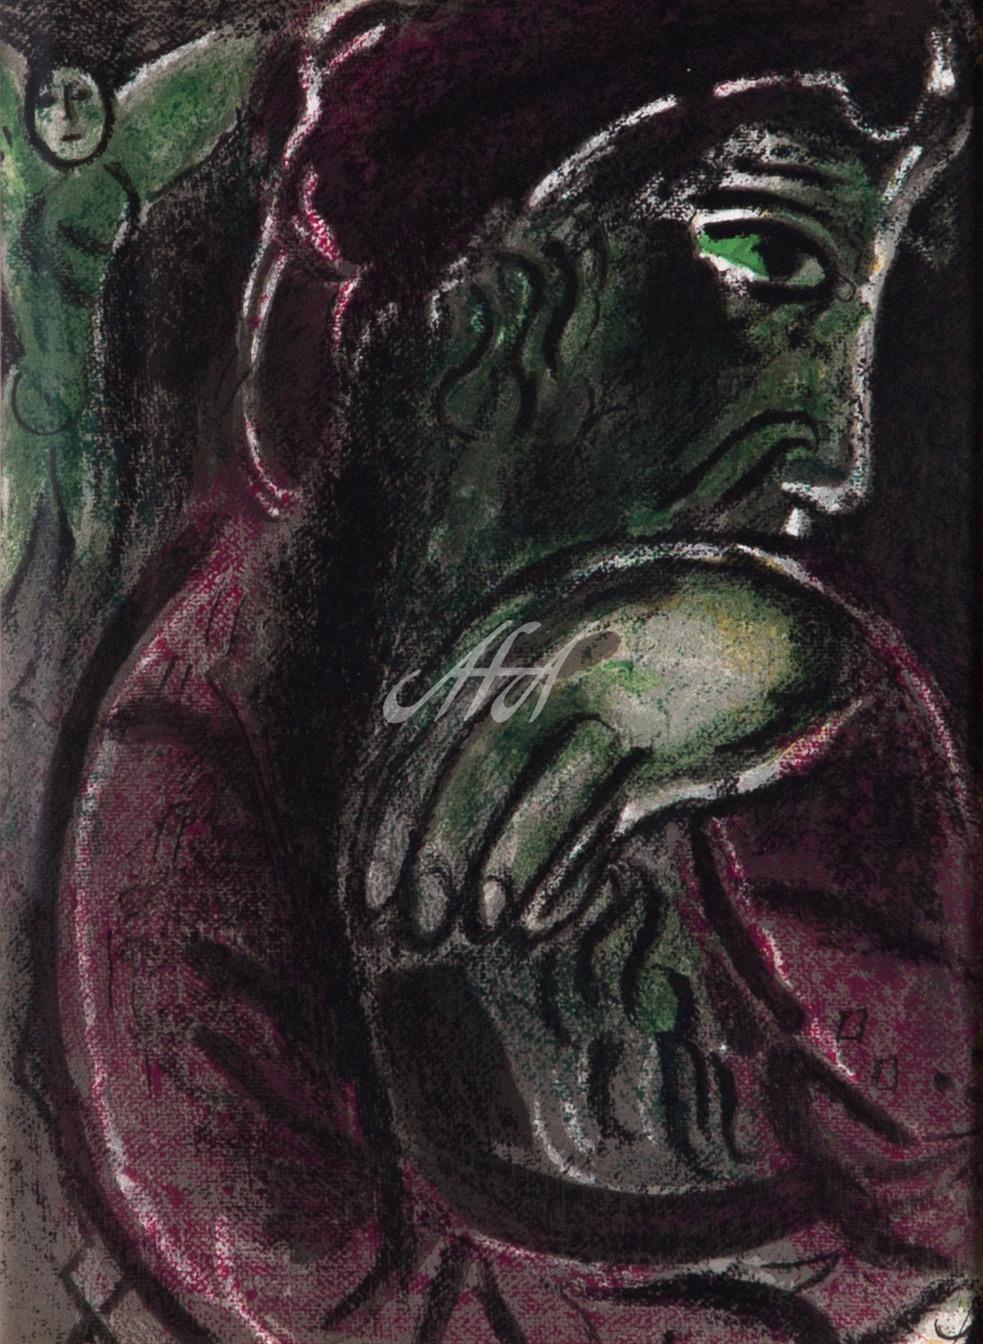 Marc_Chagall_figurative6 LoRes watermark.jpg